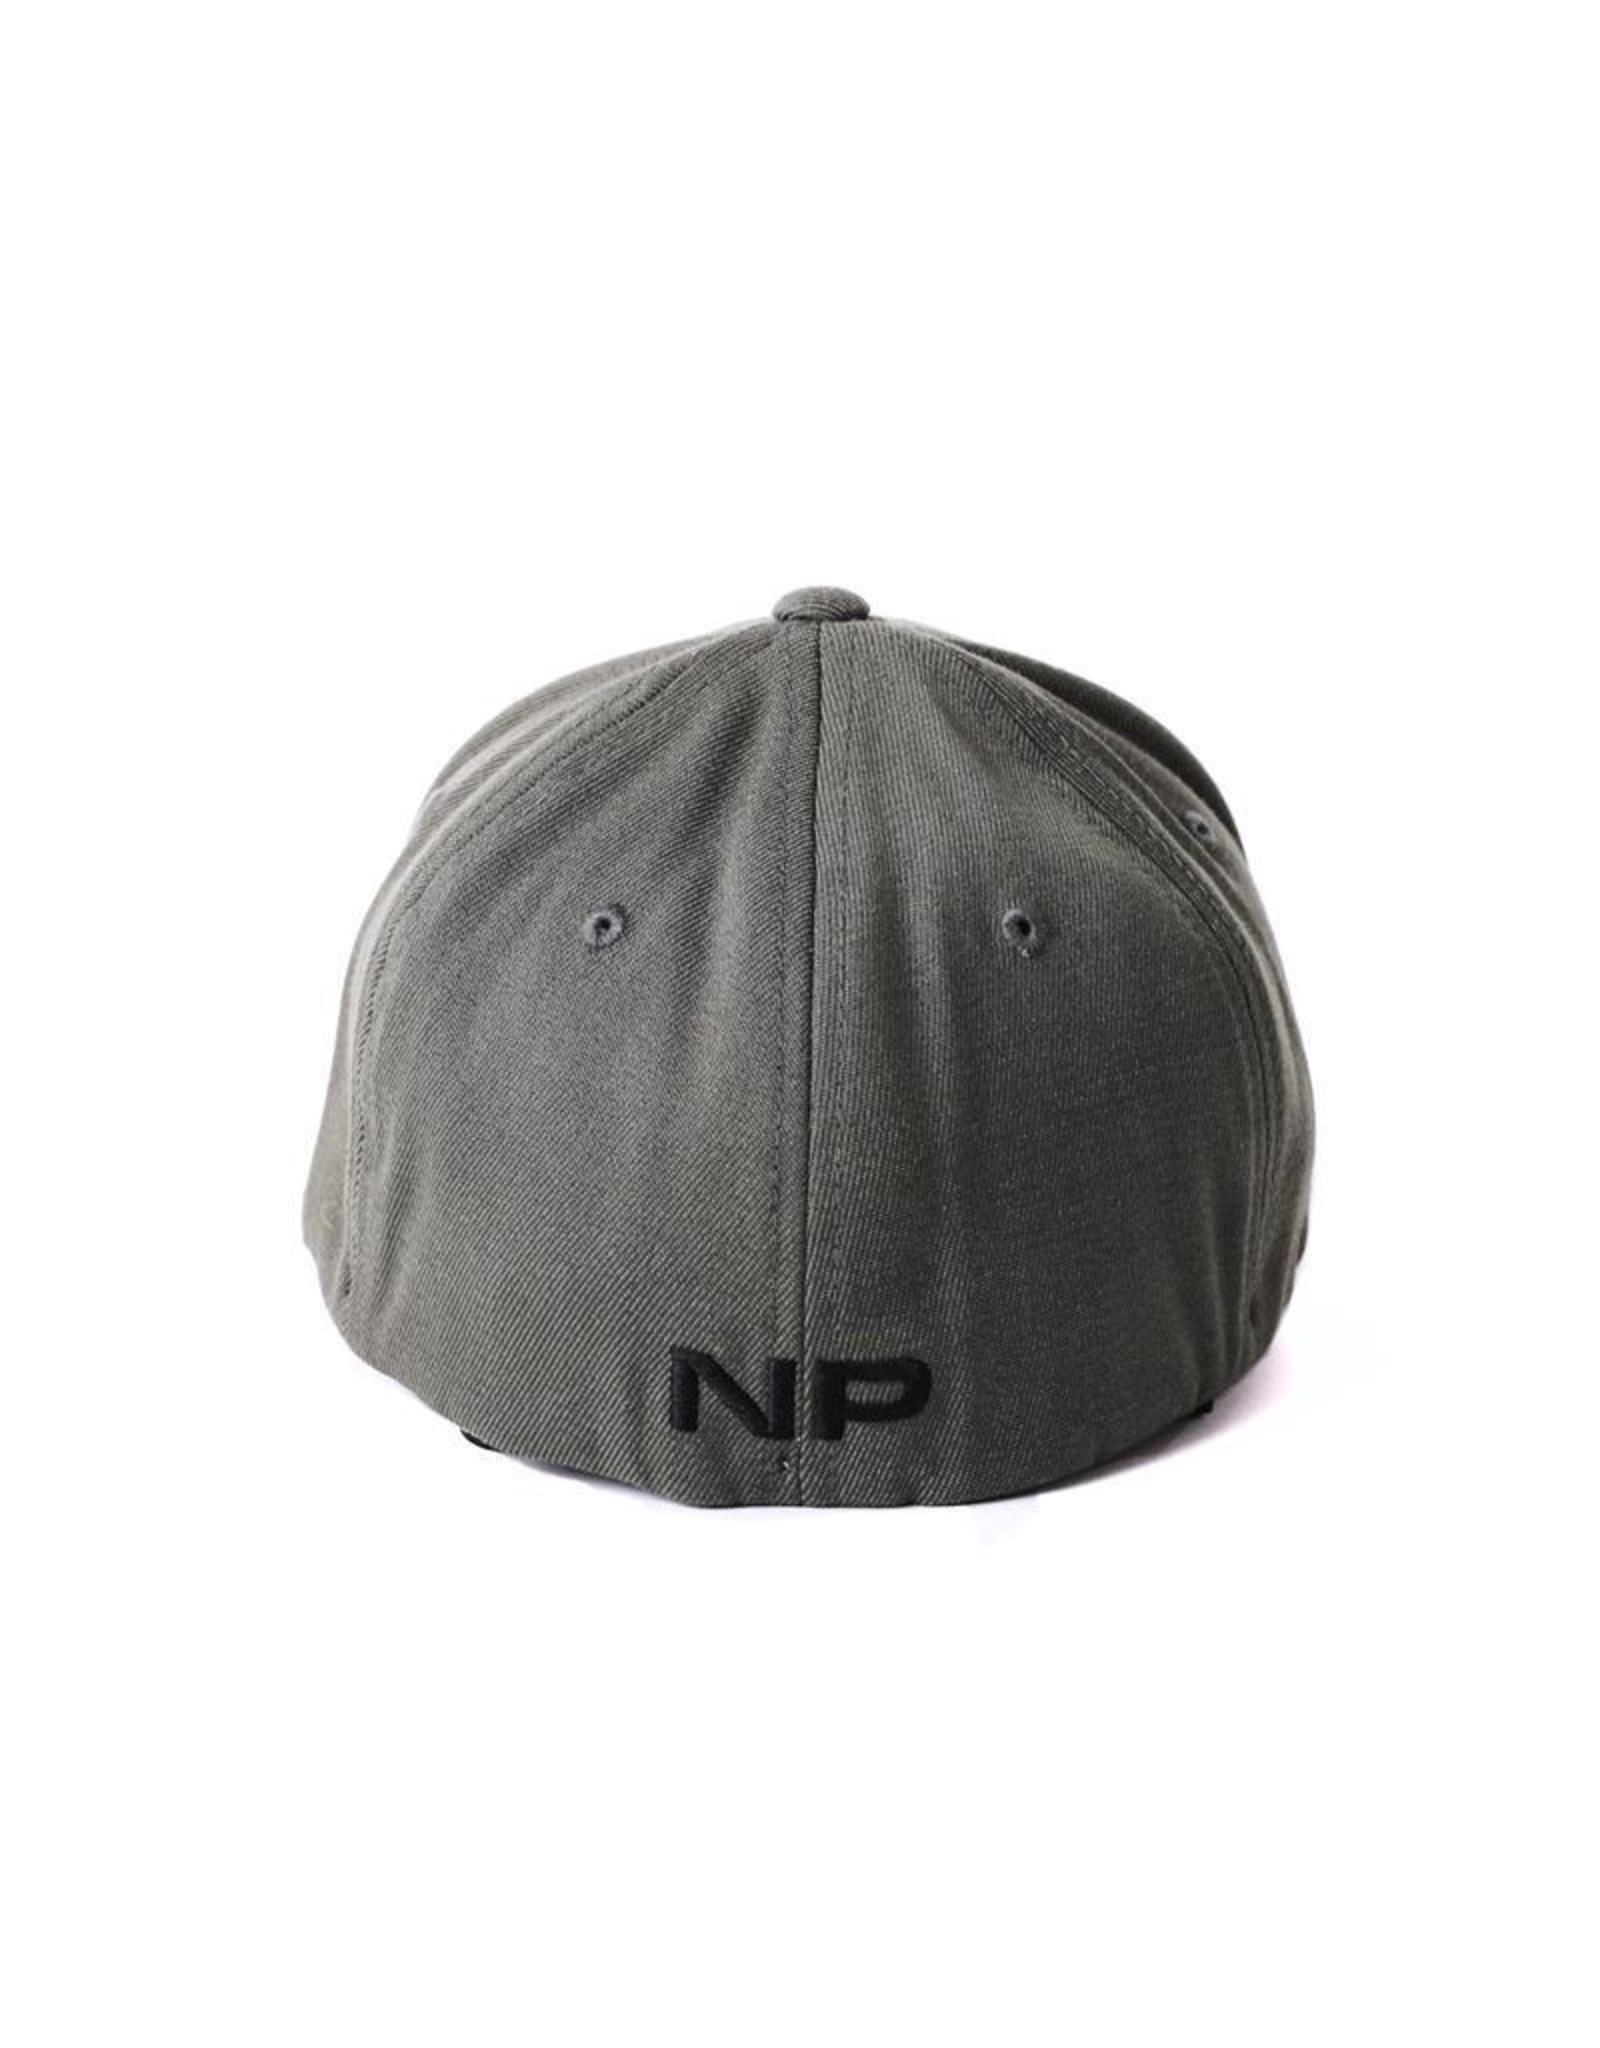 Nasty Pig Nasty Pig Snout Cap SS20